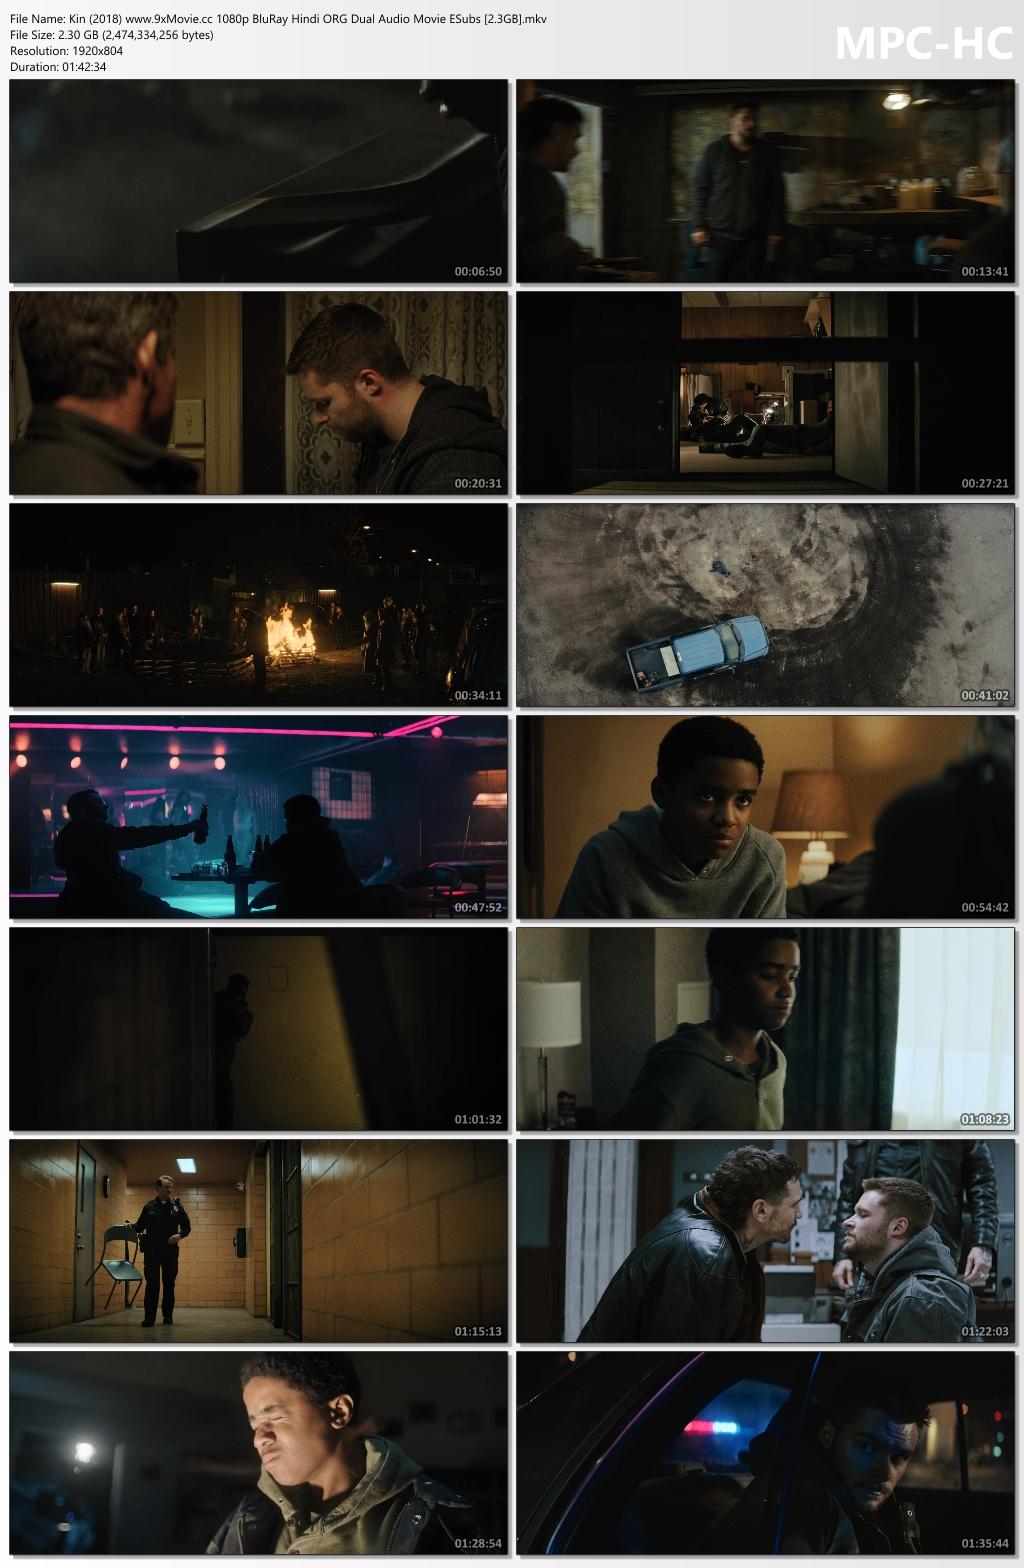 Kin-2018-www-9x-Movie-cc-1080p-Blu-Ray-Hindi-ORG-Dual-Audio-Movie-ESubs-2-3-GB-mkv